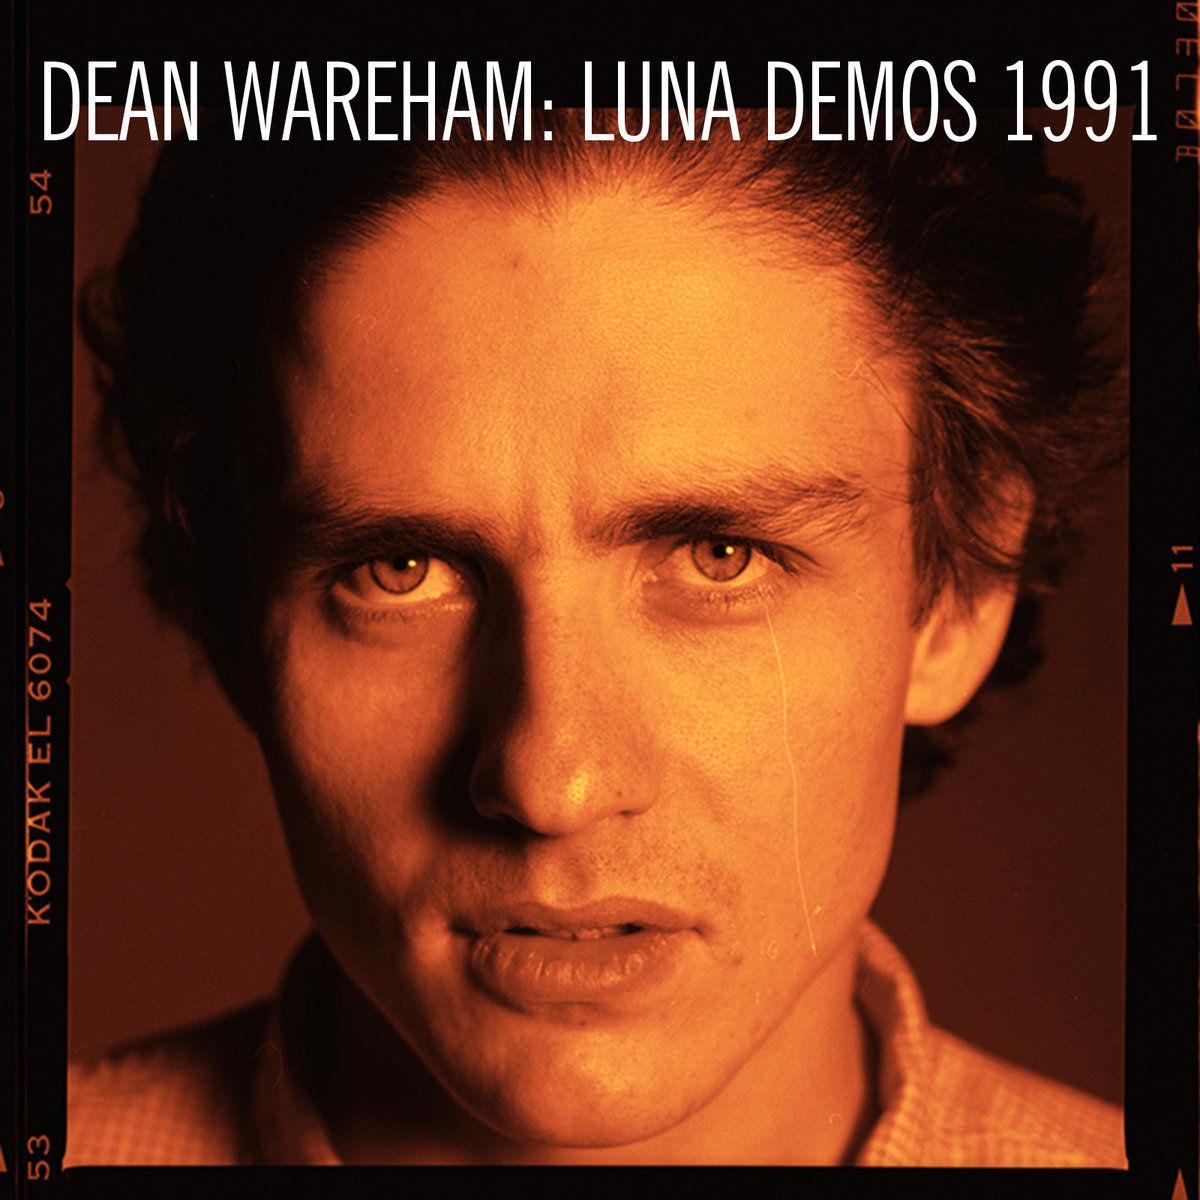 Luna Demos 1991 sleeve image